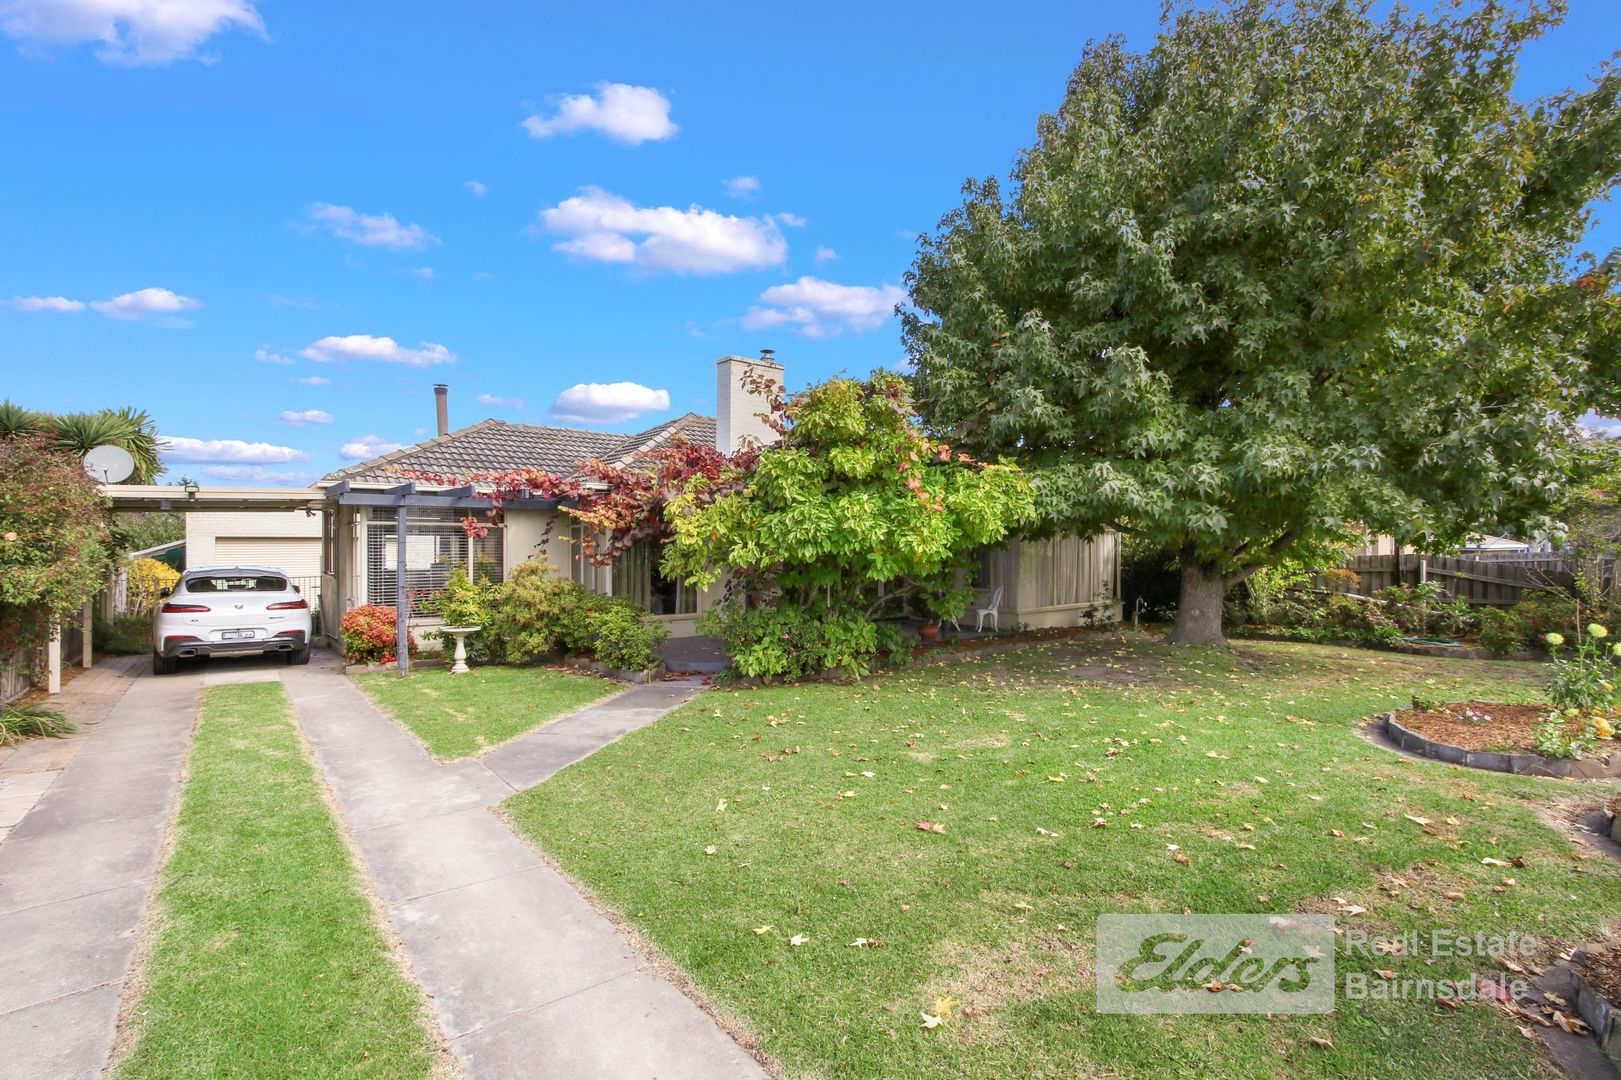 27 Moroney Street, Bairnsdale VIC 3875, Image 0